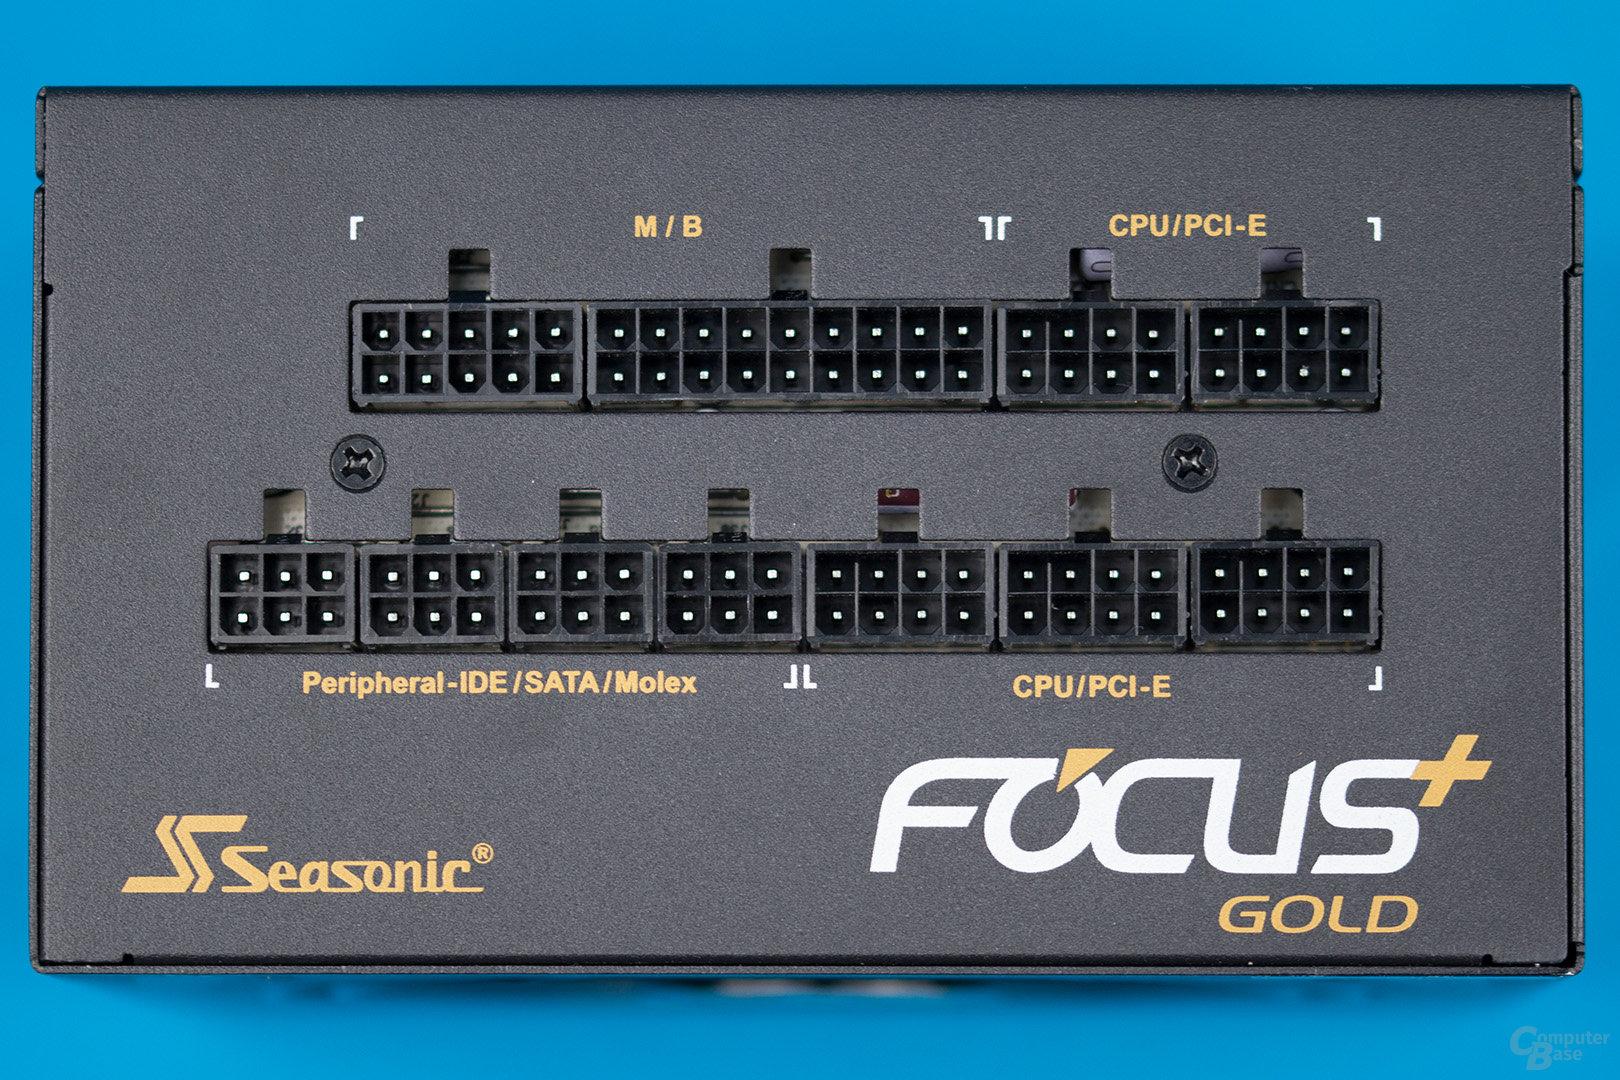 Sea Sonic Focus Plus Gold 550W – Anschlussplatine